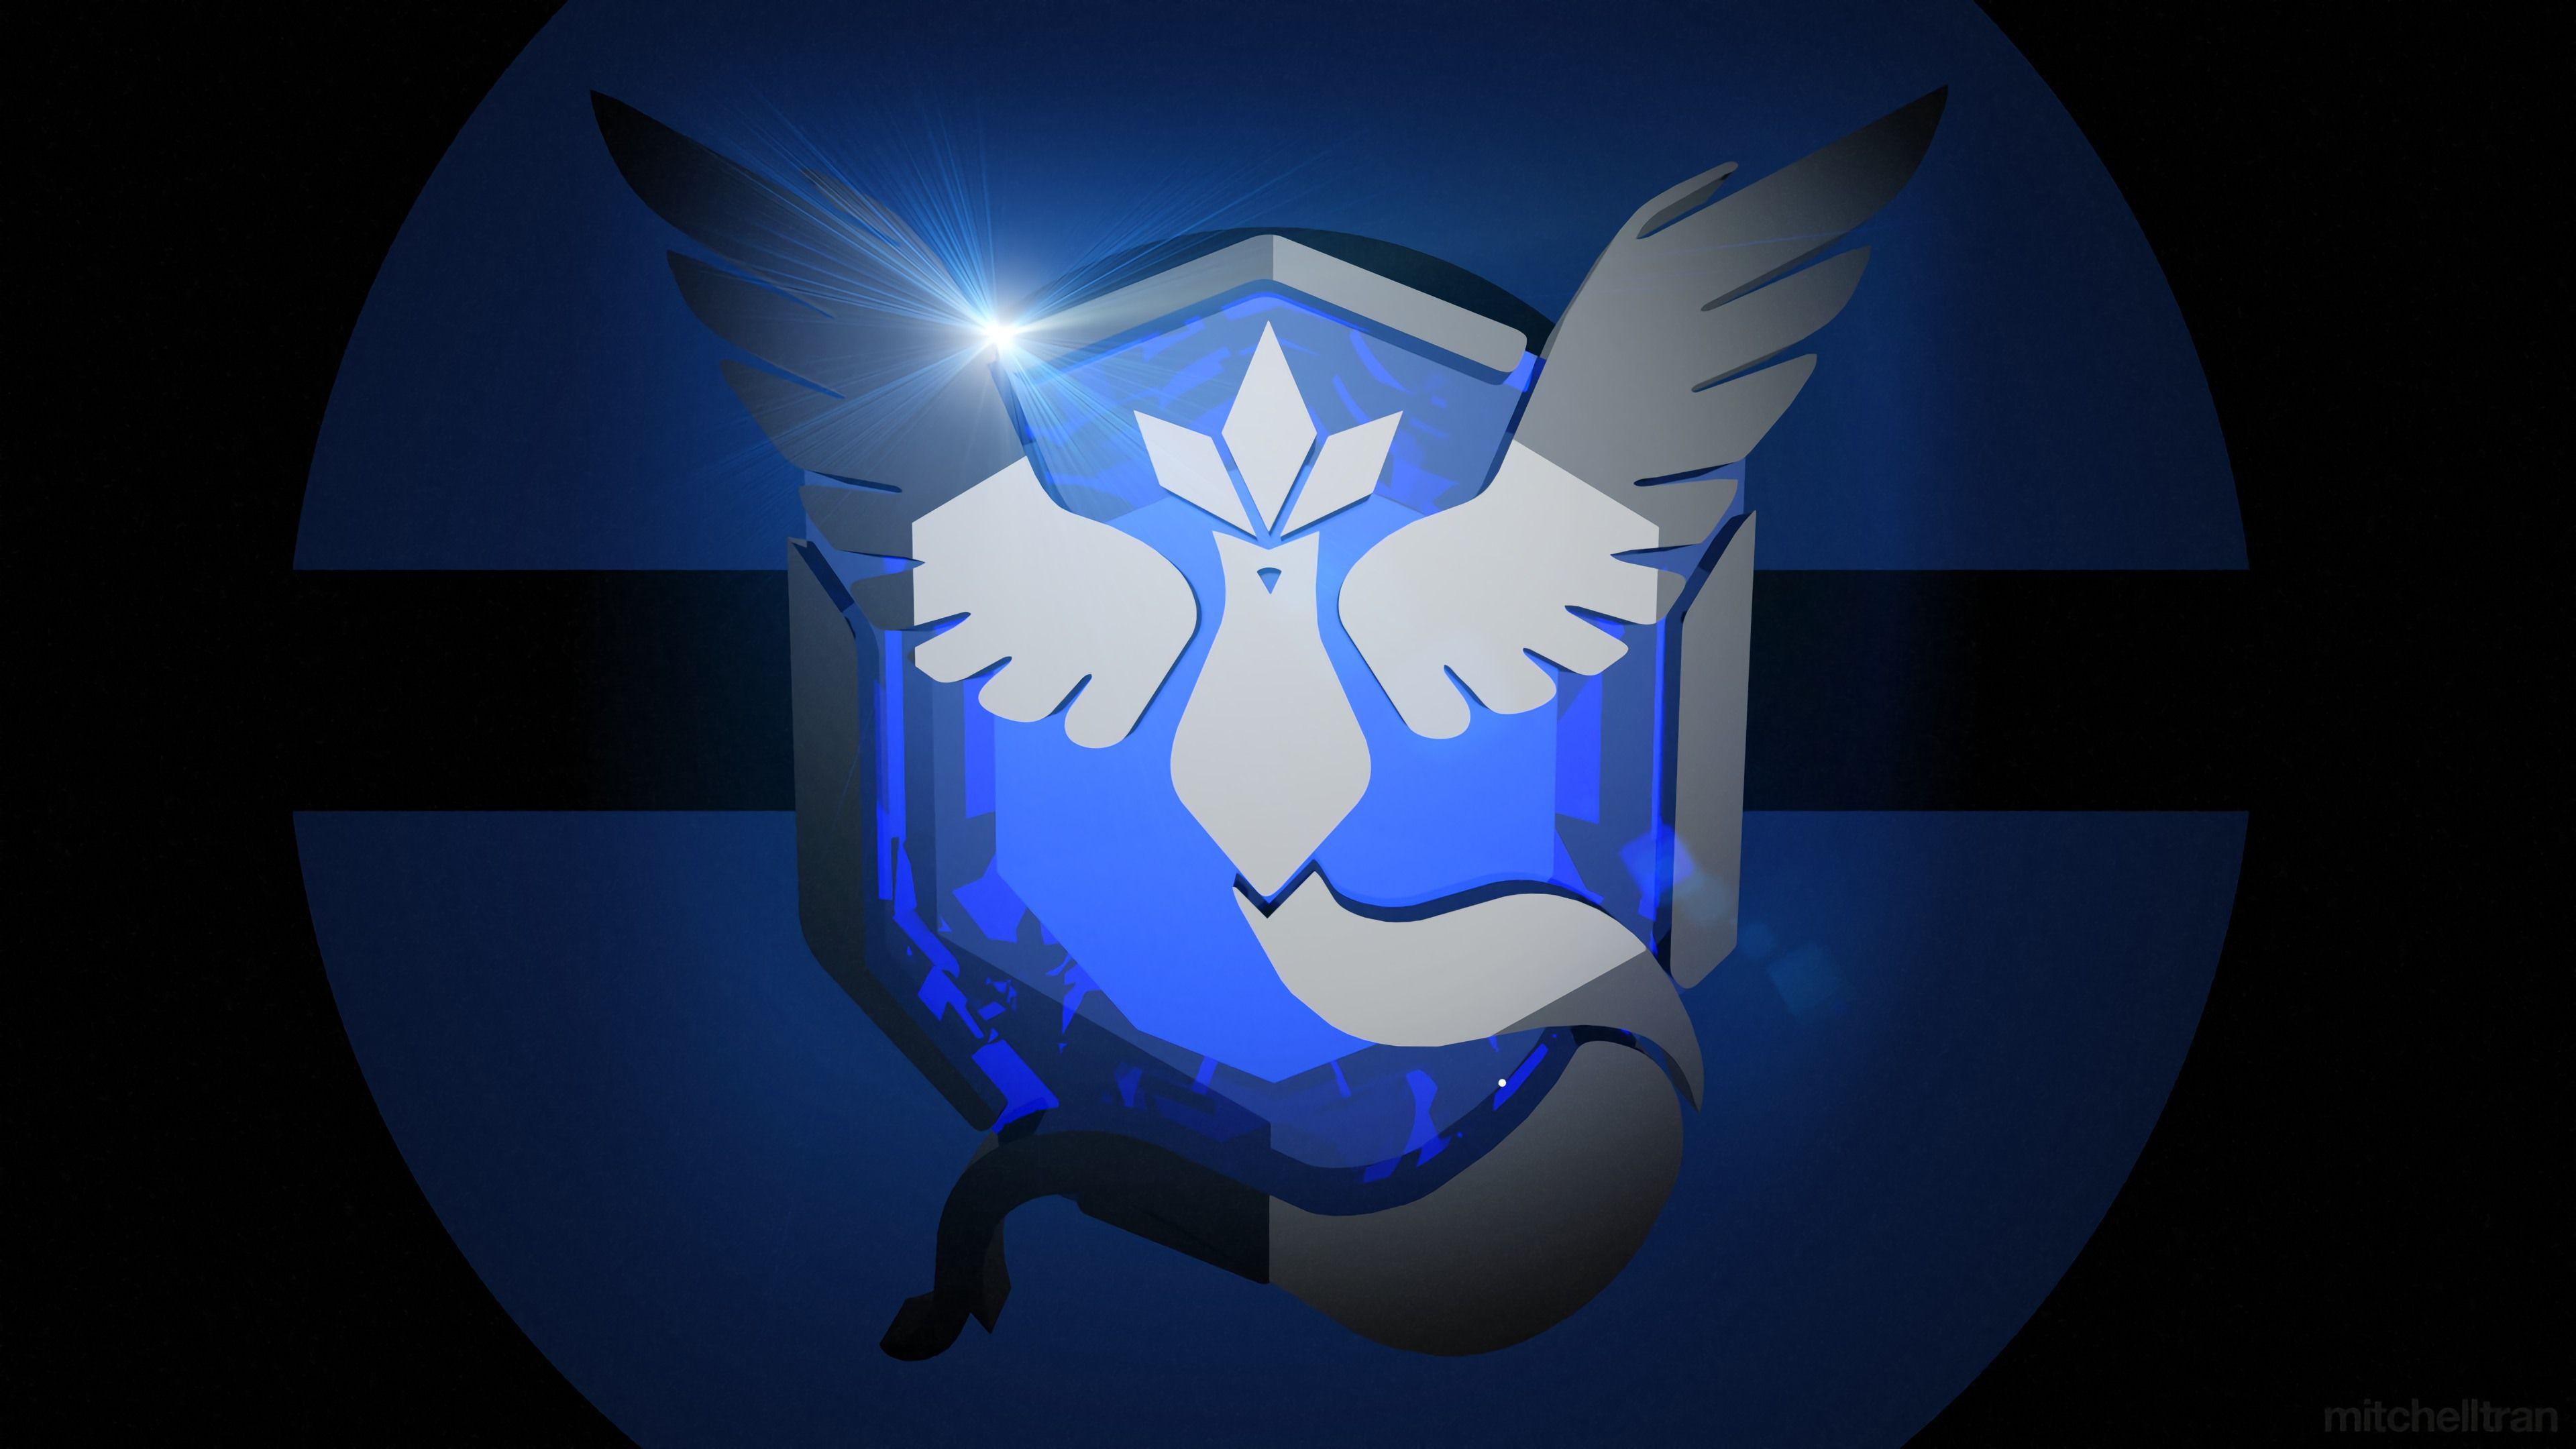 Download Team Mystic Pokemon Go Logo Wallpaper 4K